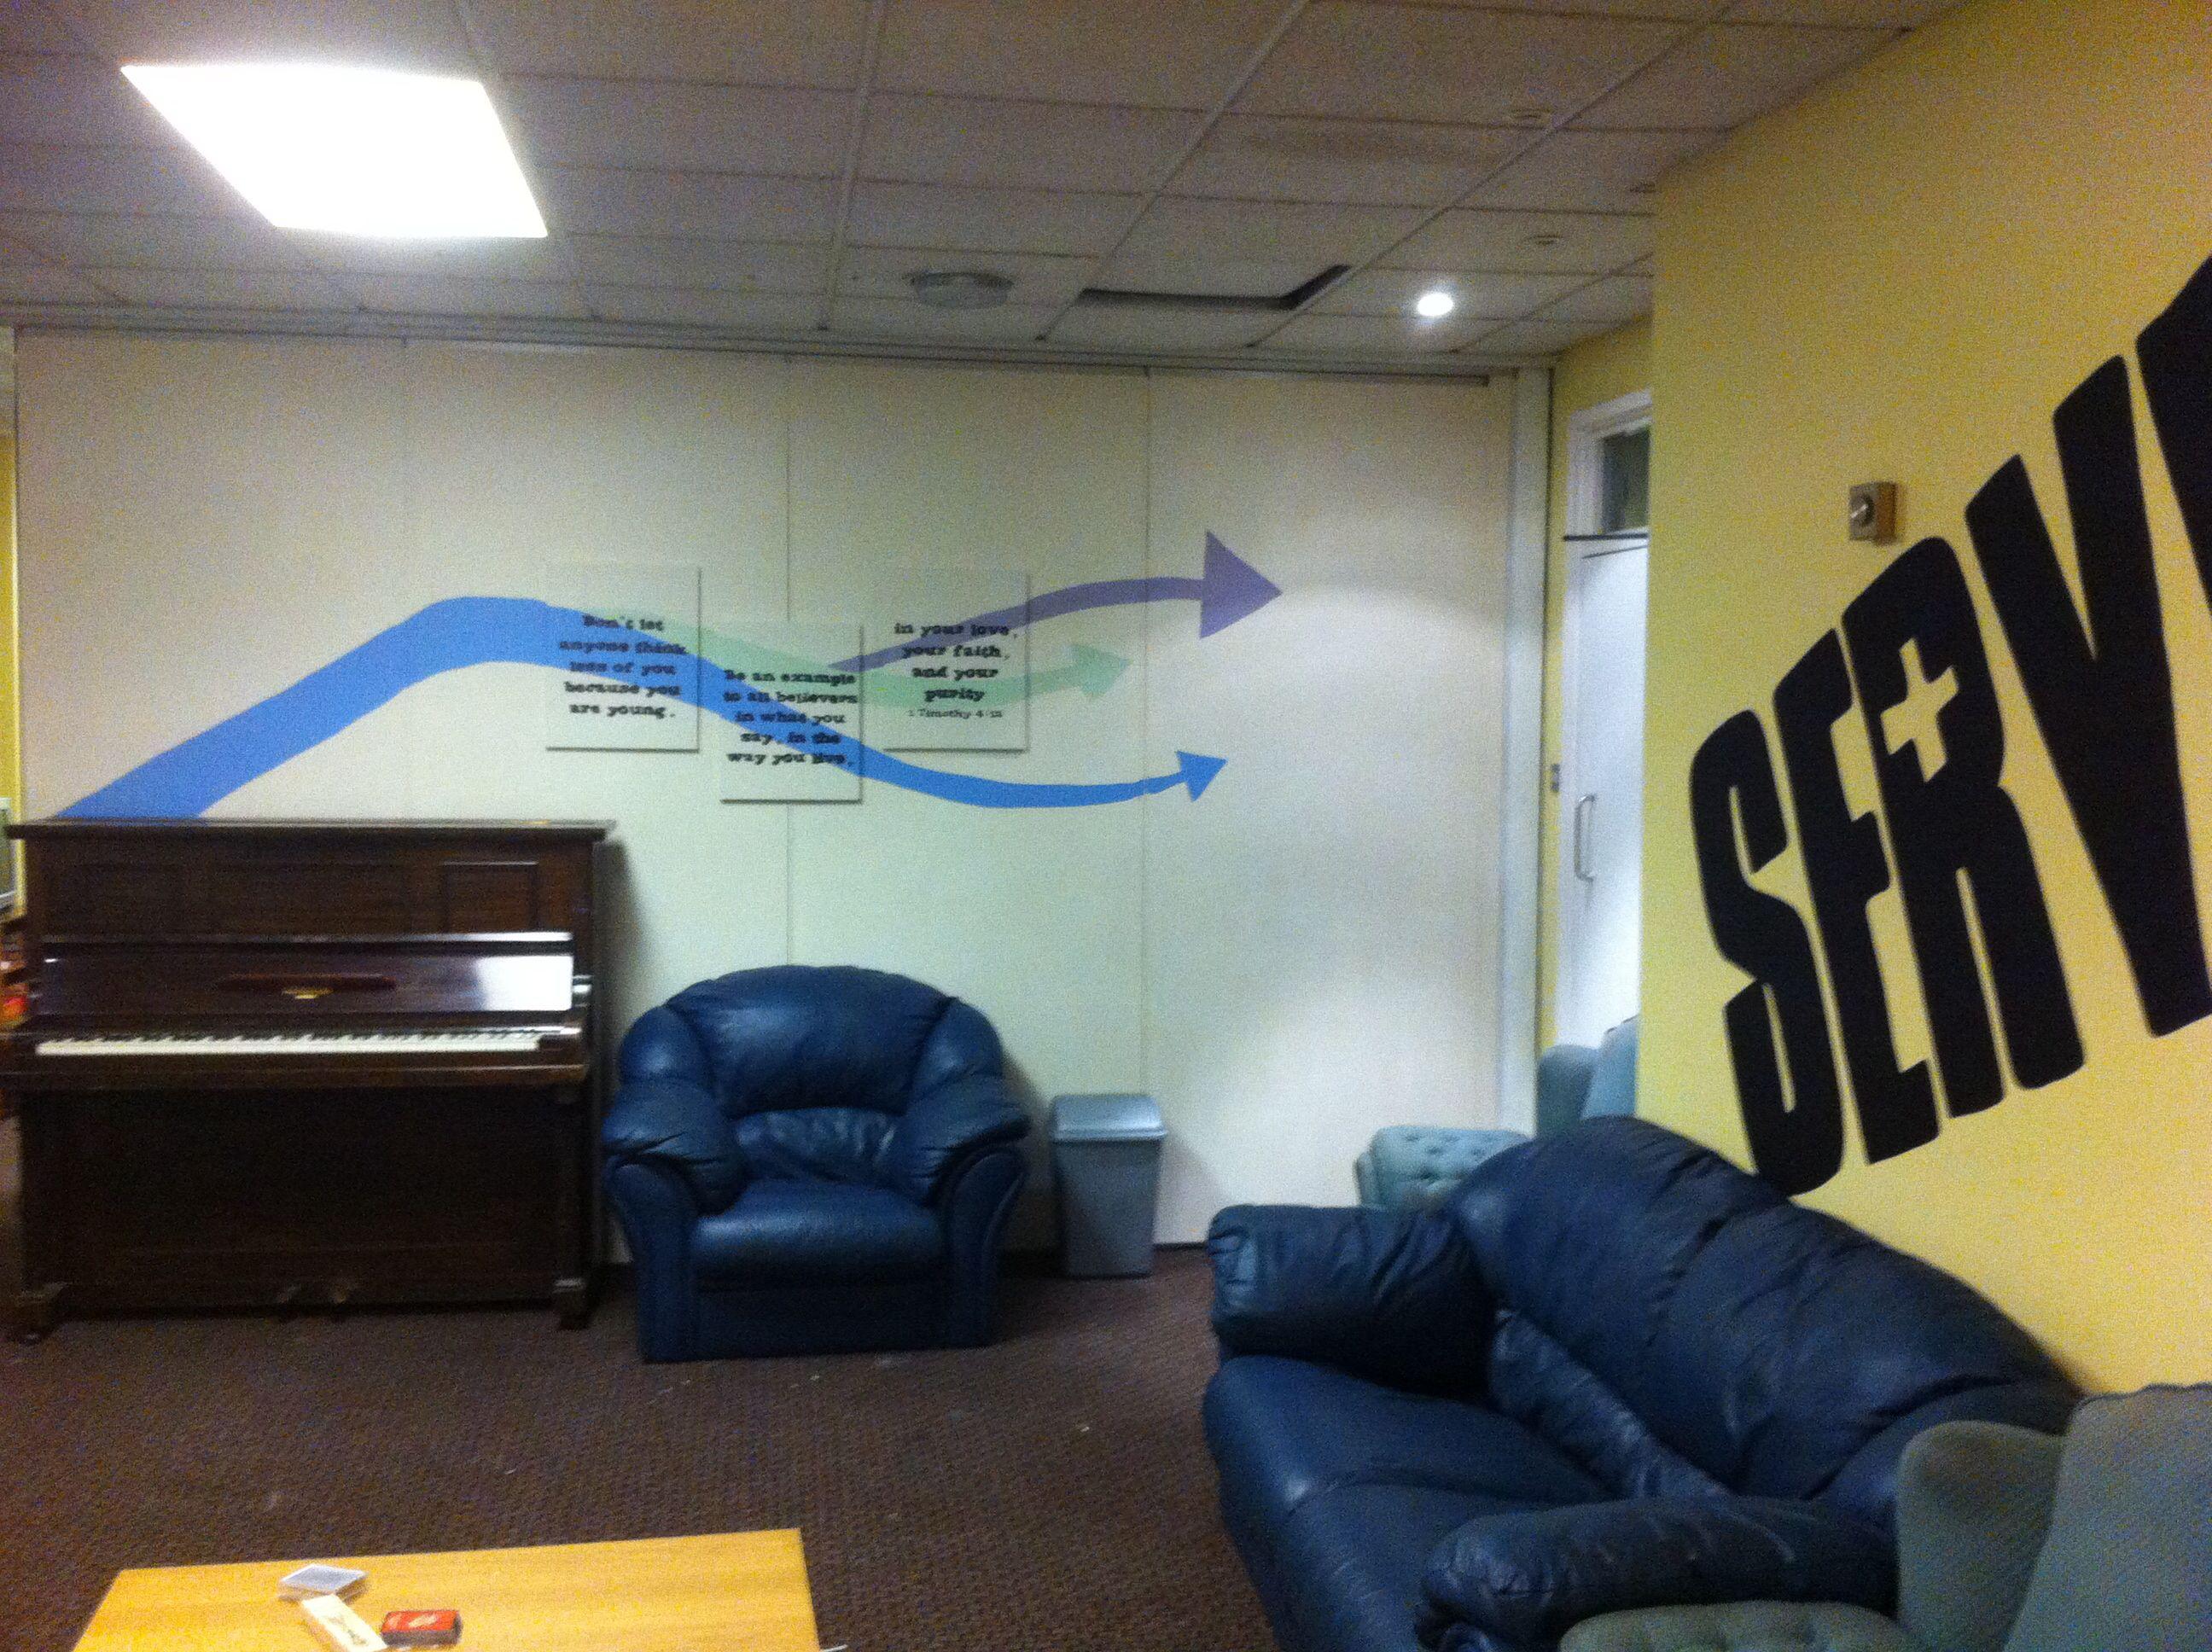 Church Youth Room Cheap Easy Idea Decoration Youth Room Youth Group Rooms Church Decor